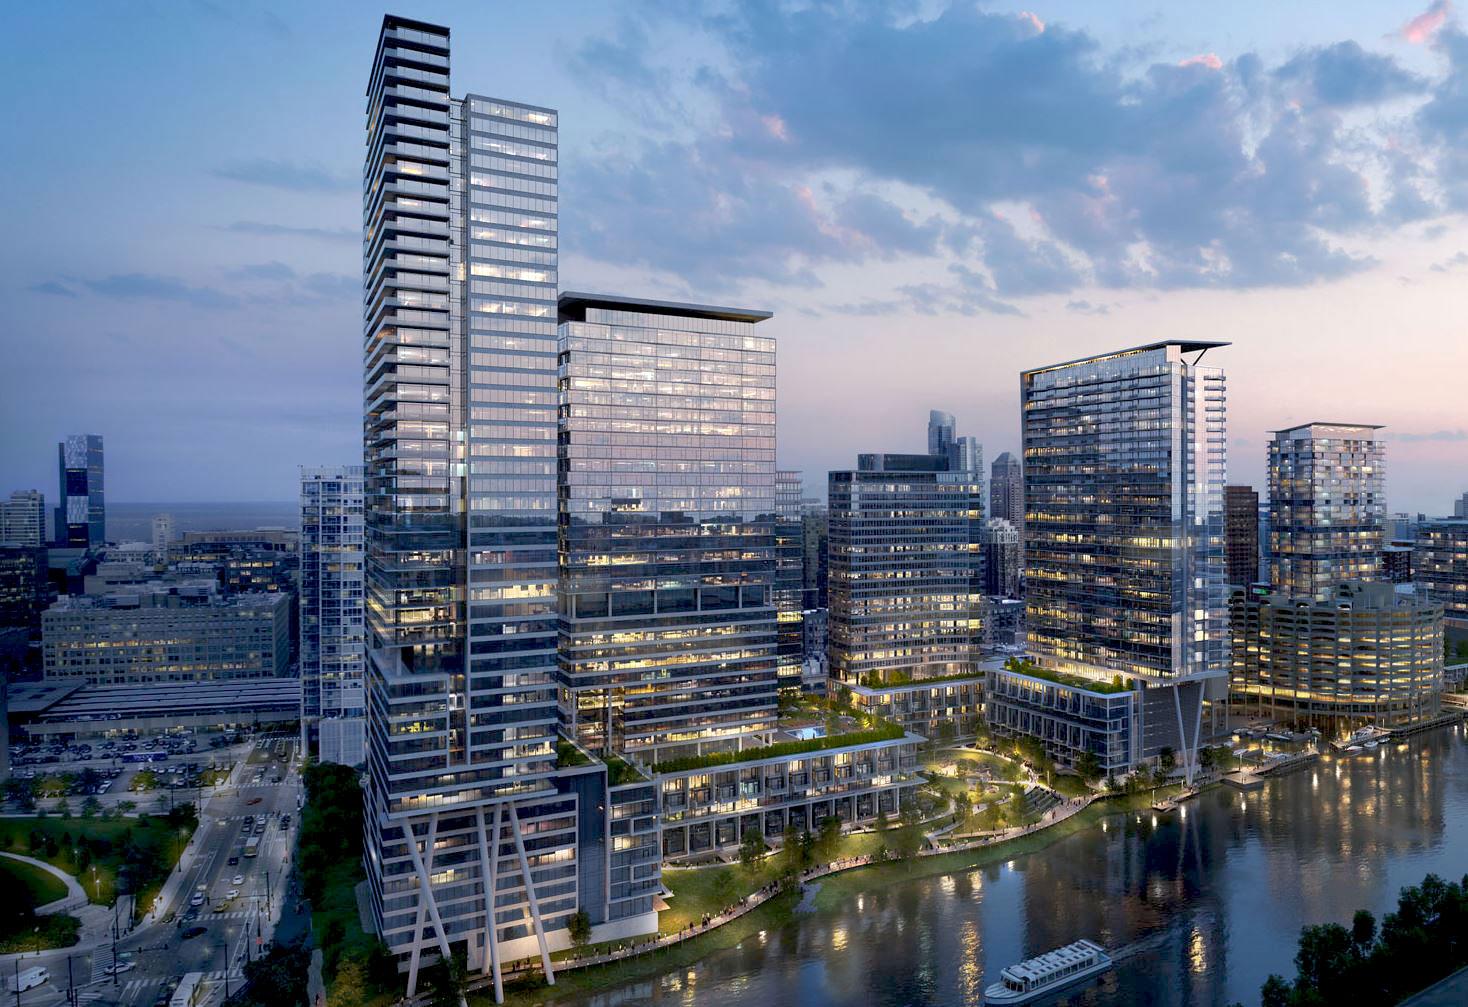 Chicago River Development